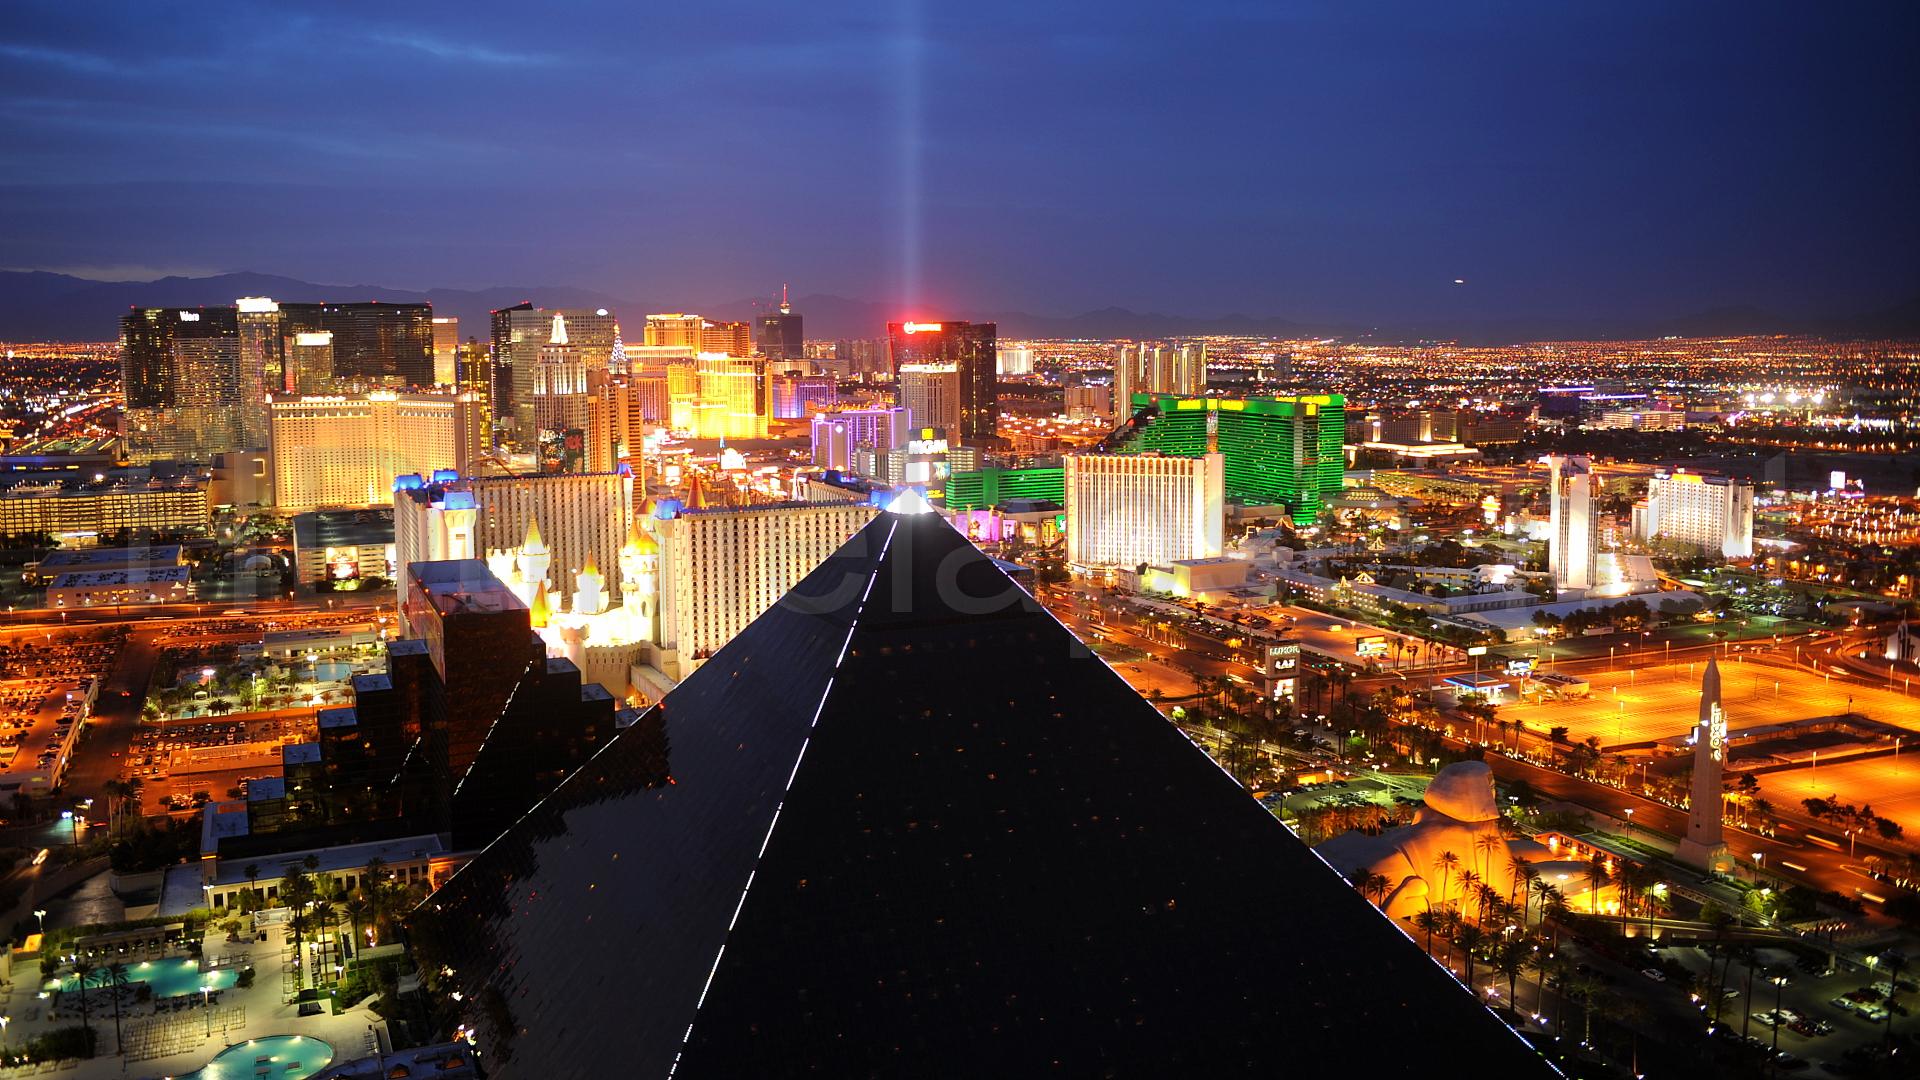 Best 40 Las Vegas Strip Wallpaper on HipWallpaper Easiest Way 1920x1080